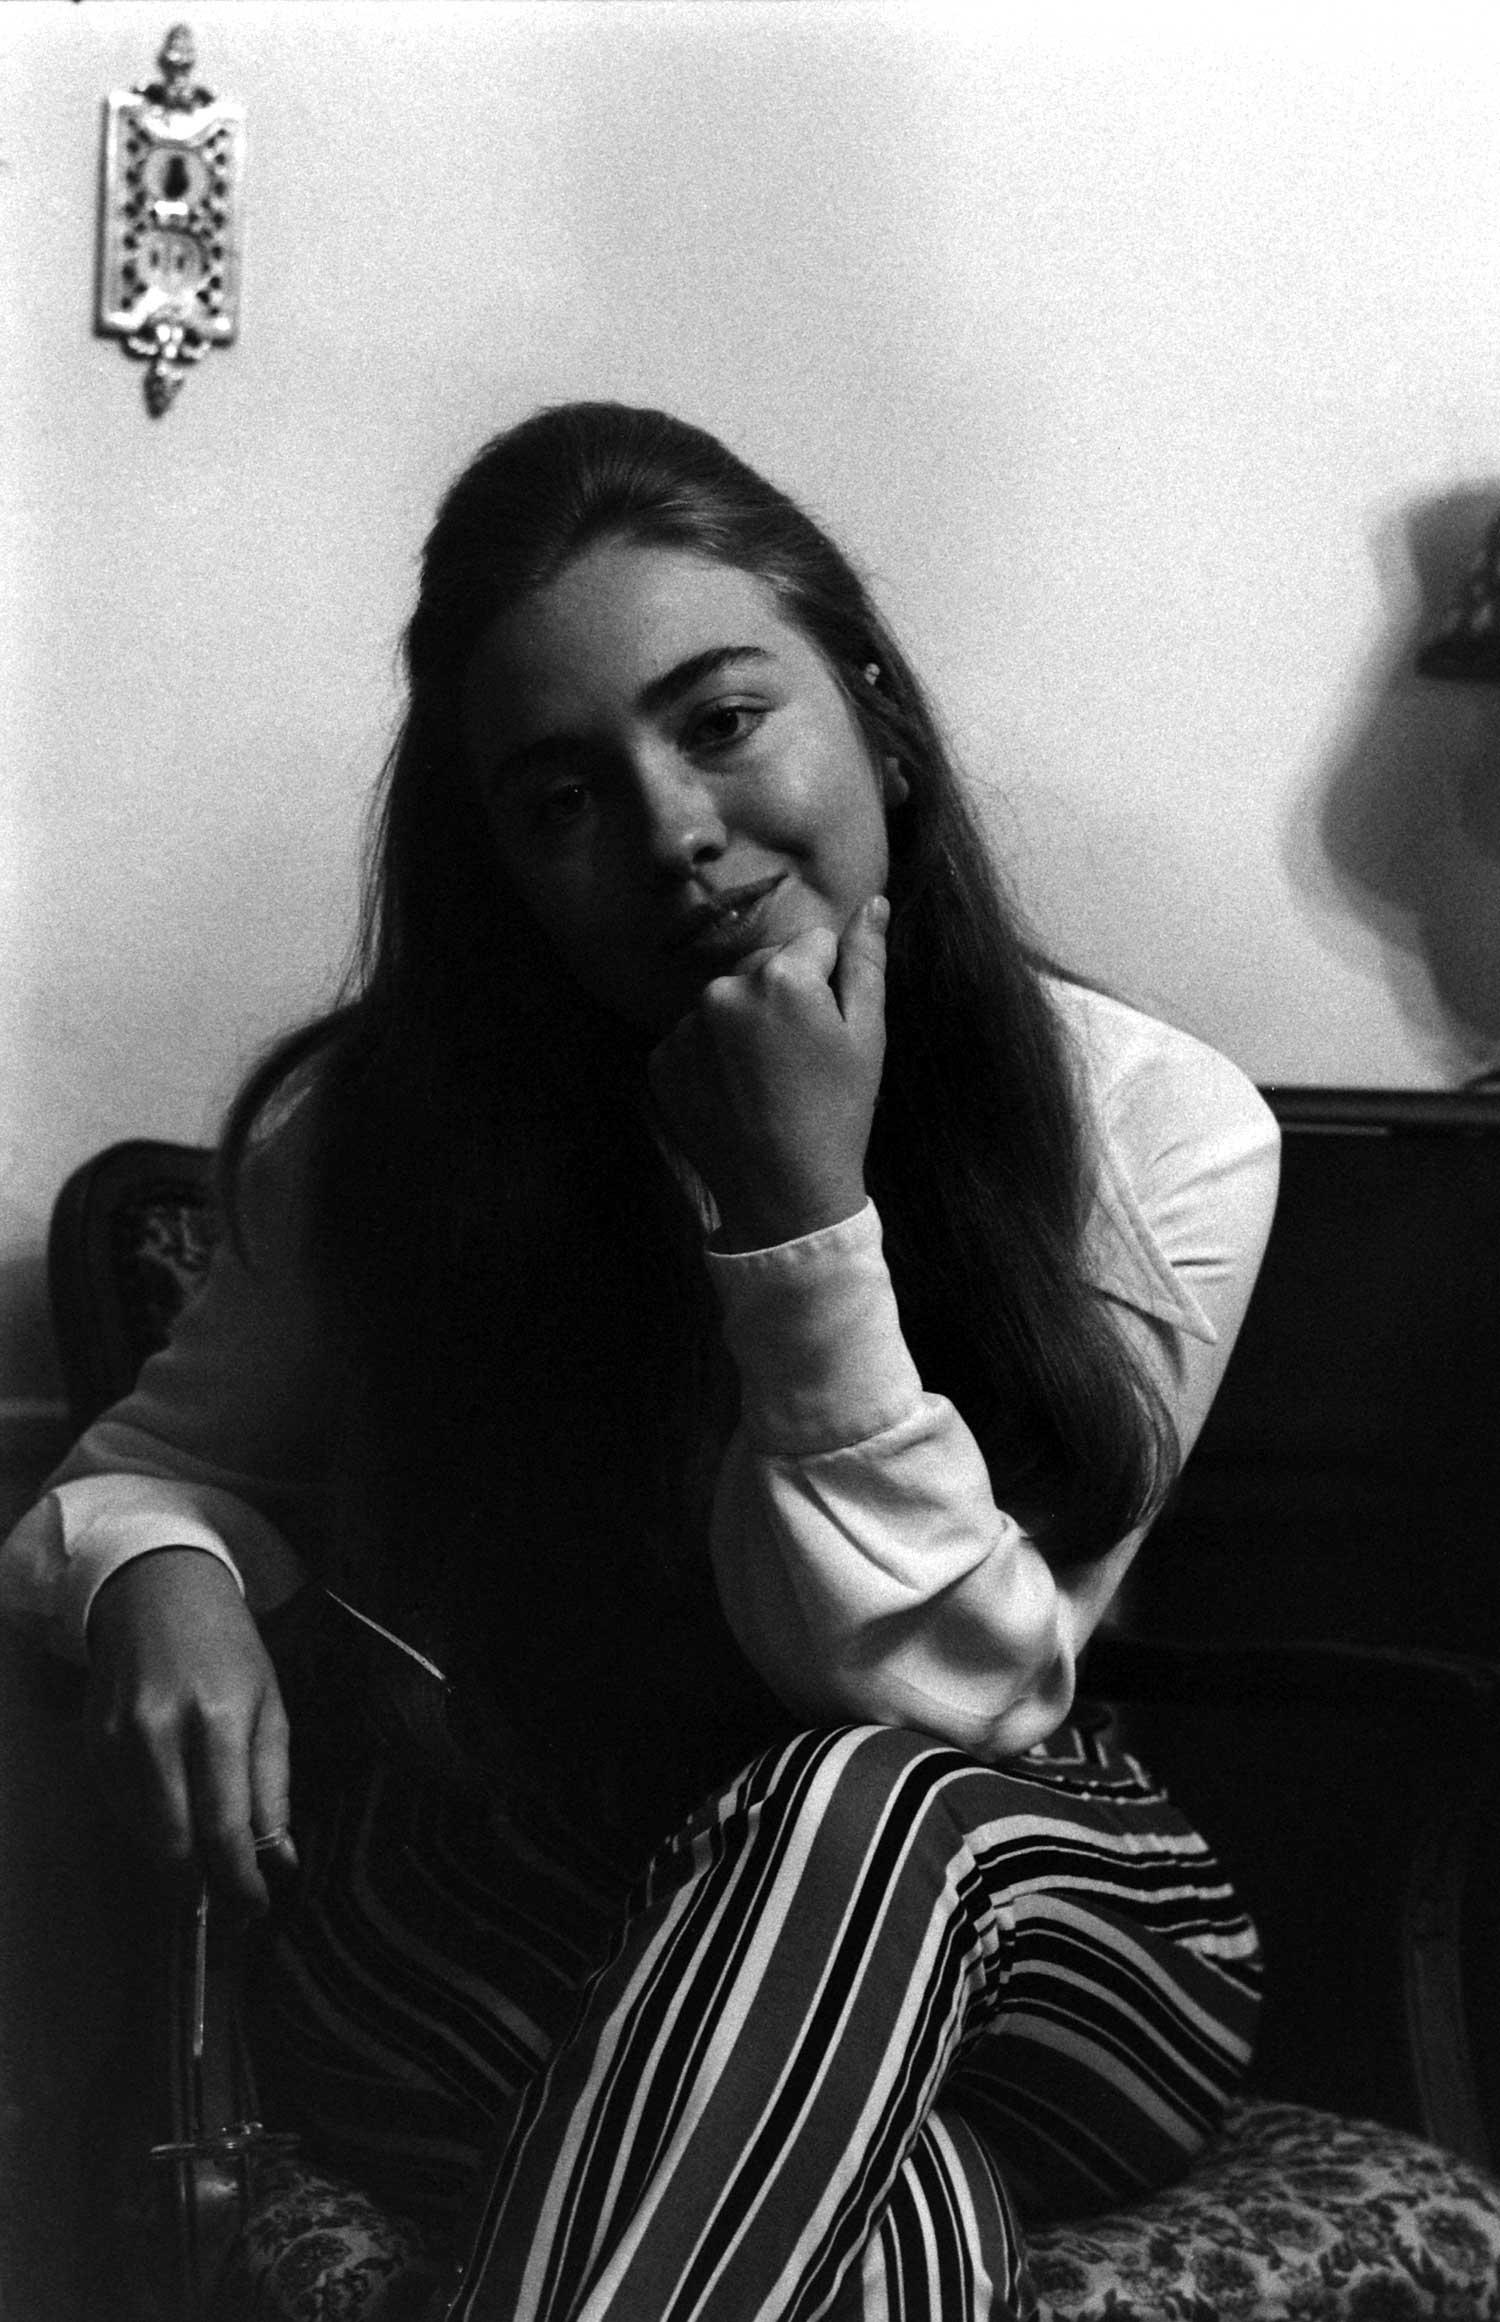 <b>Not published in LIFE.</b> Hillary Rodham (later Hillary Rodham Clinton), Park Ridge, Illinois, June 1969.